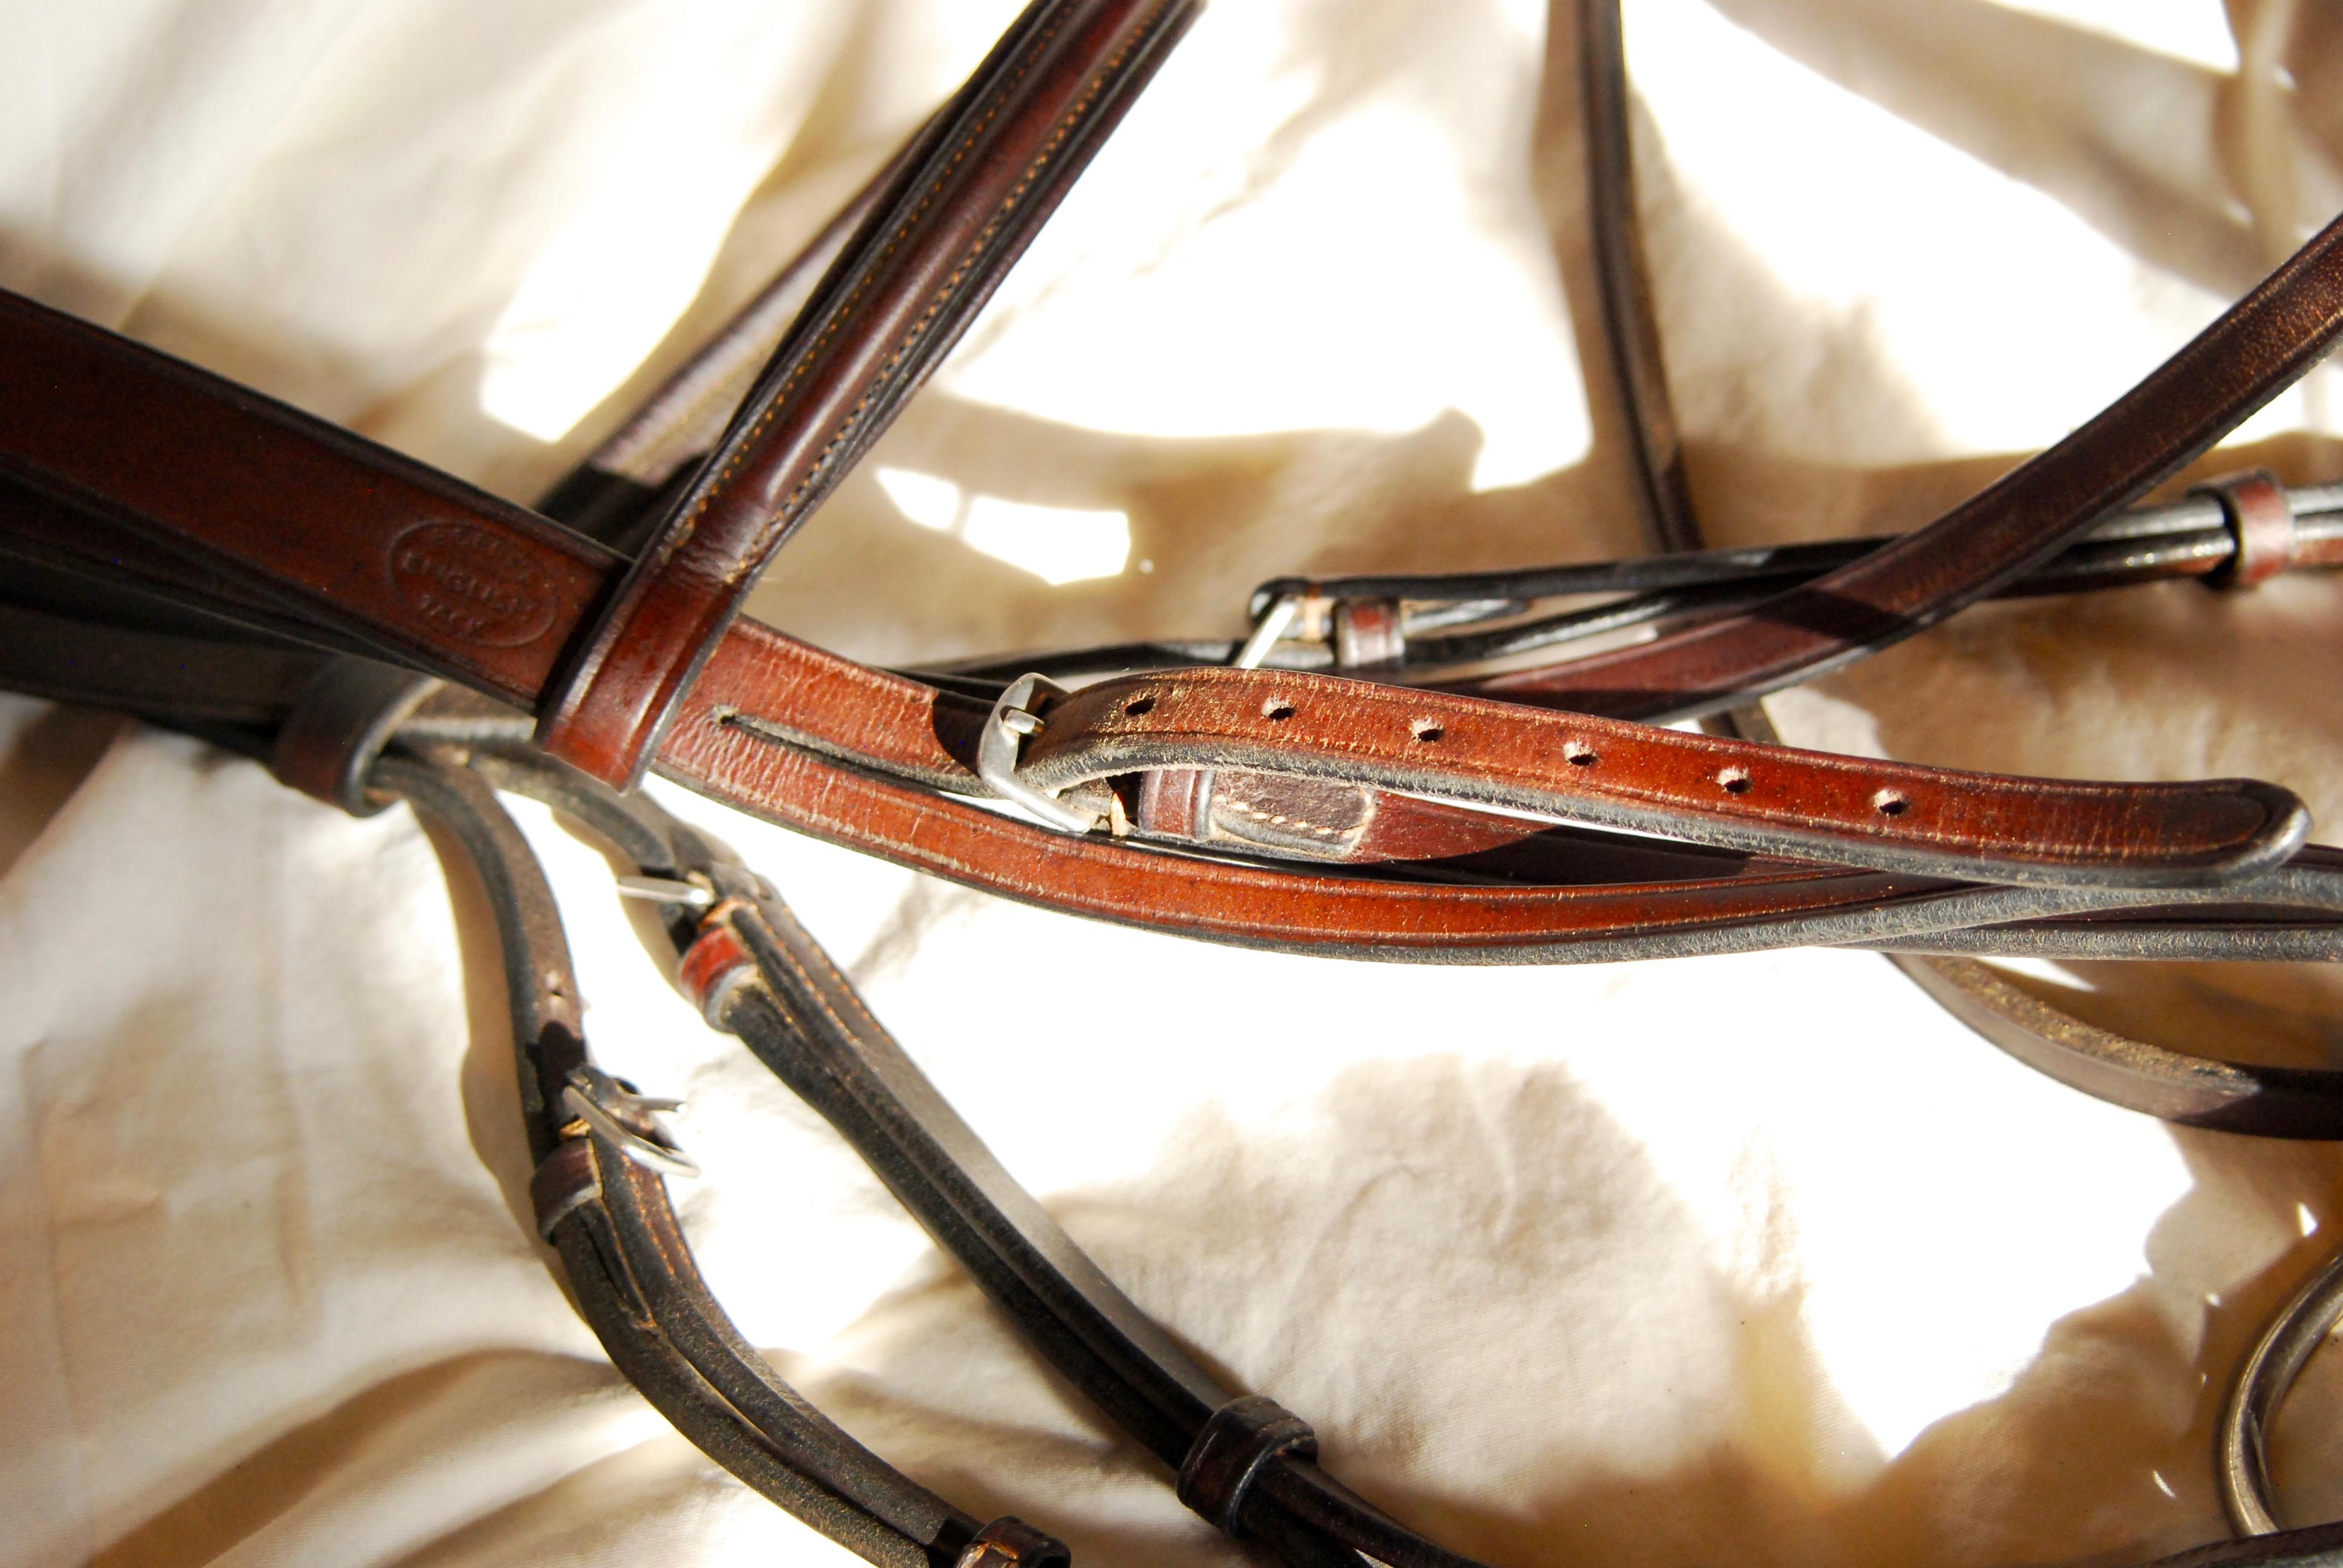 Partially unbuckled strap